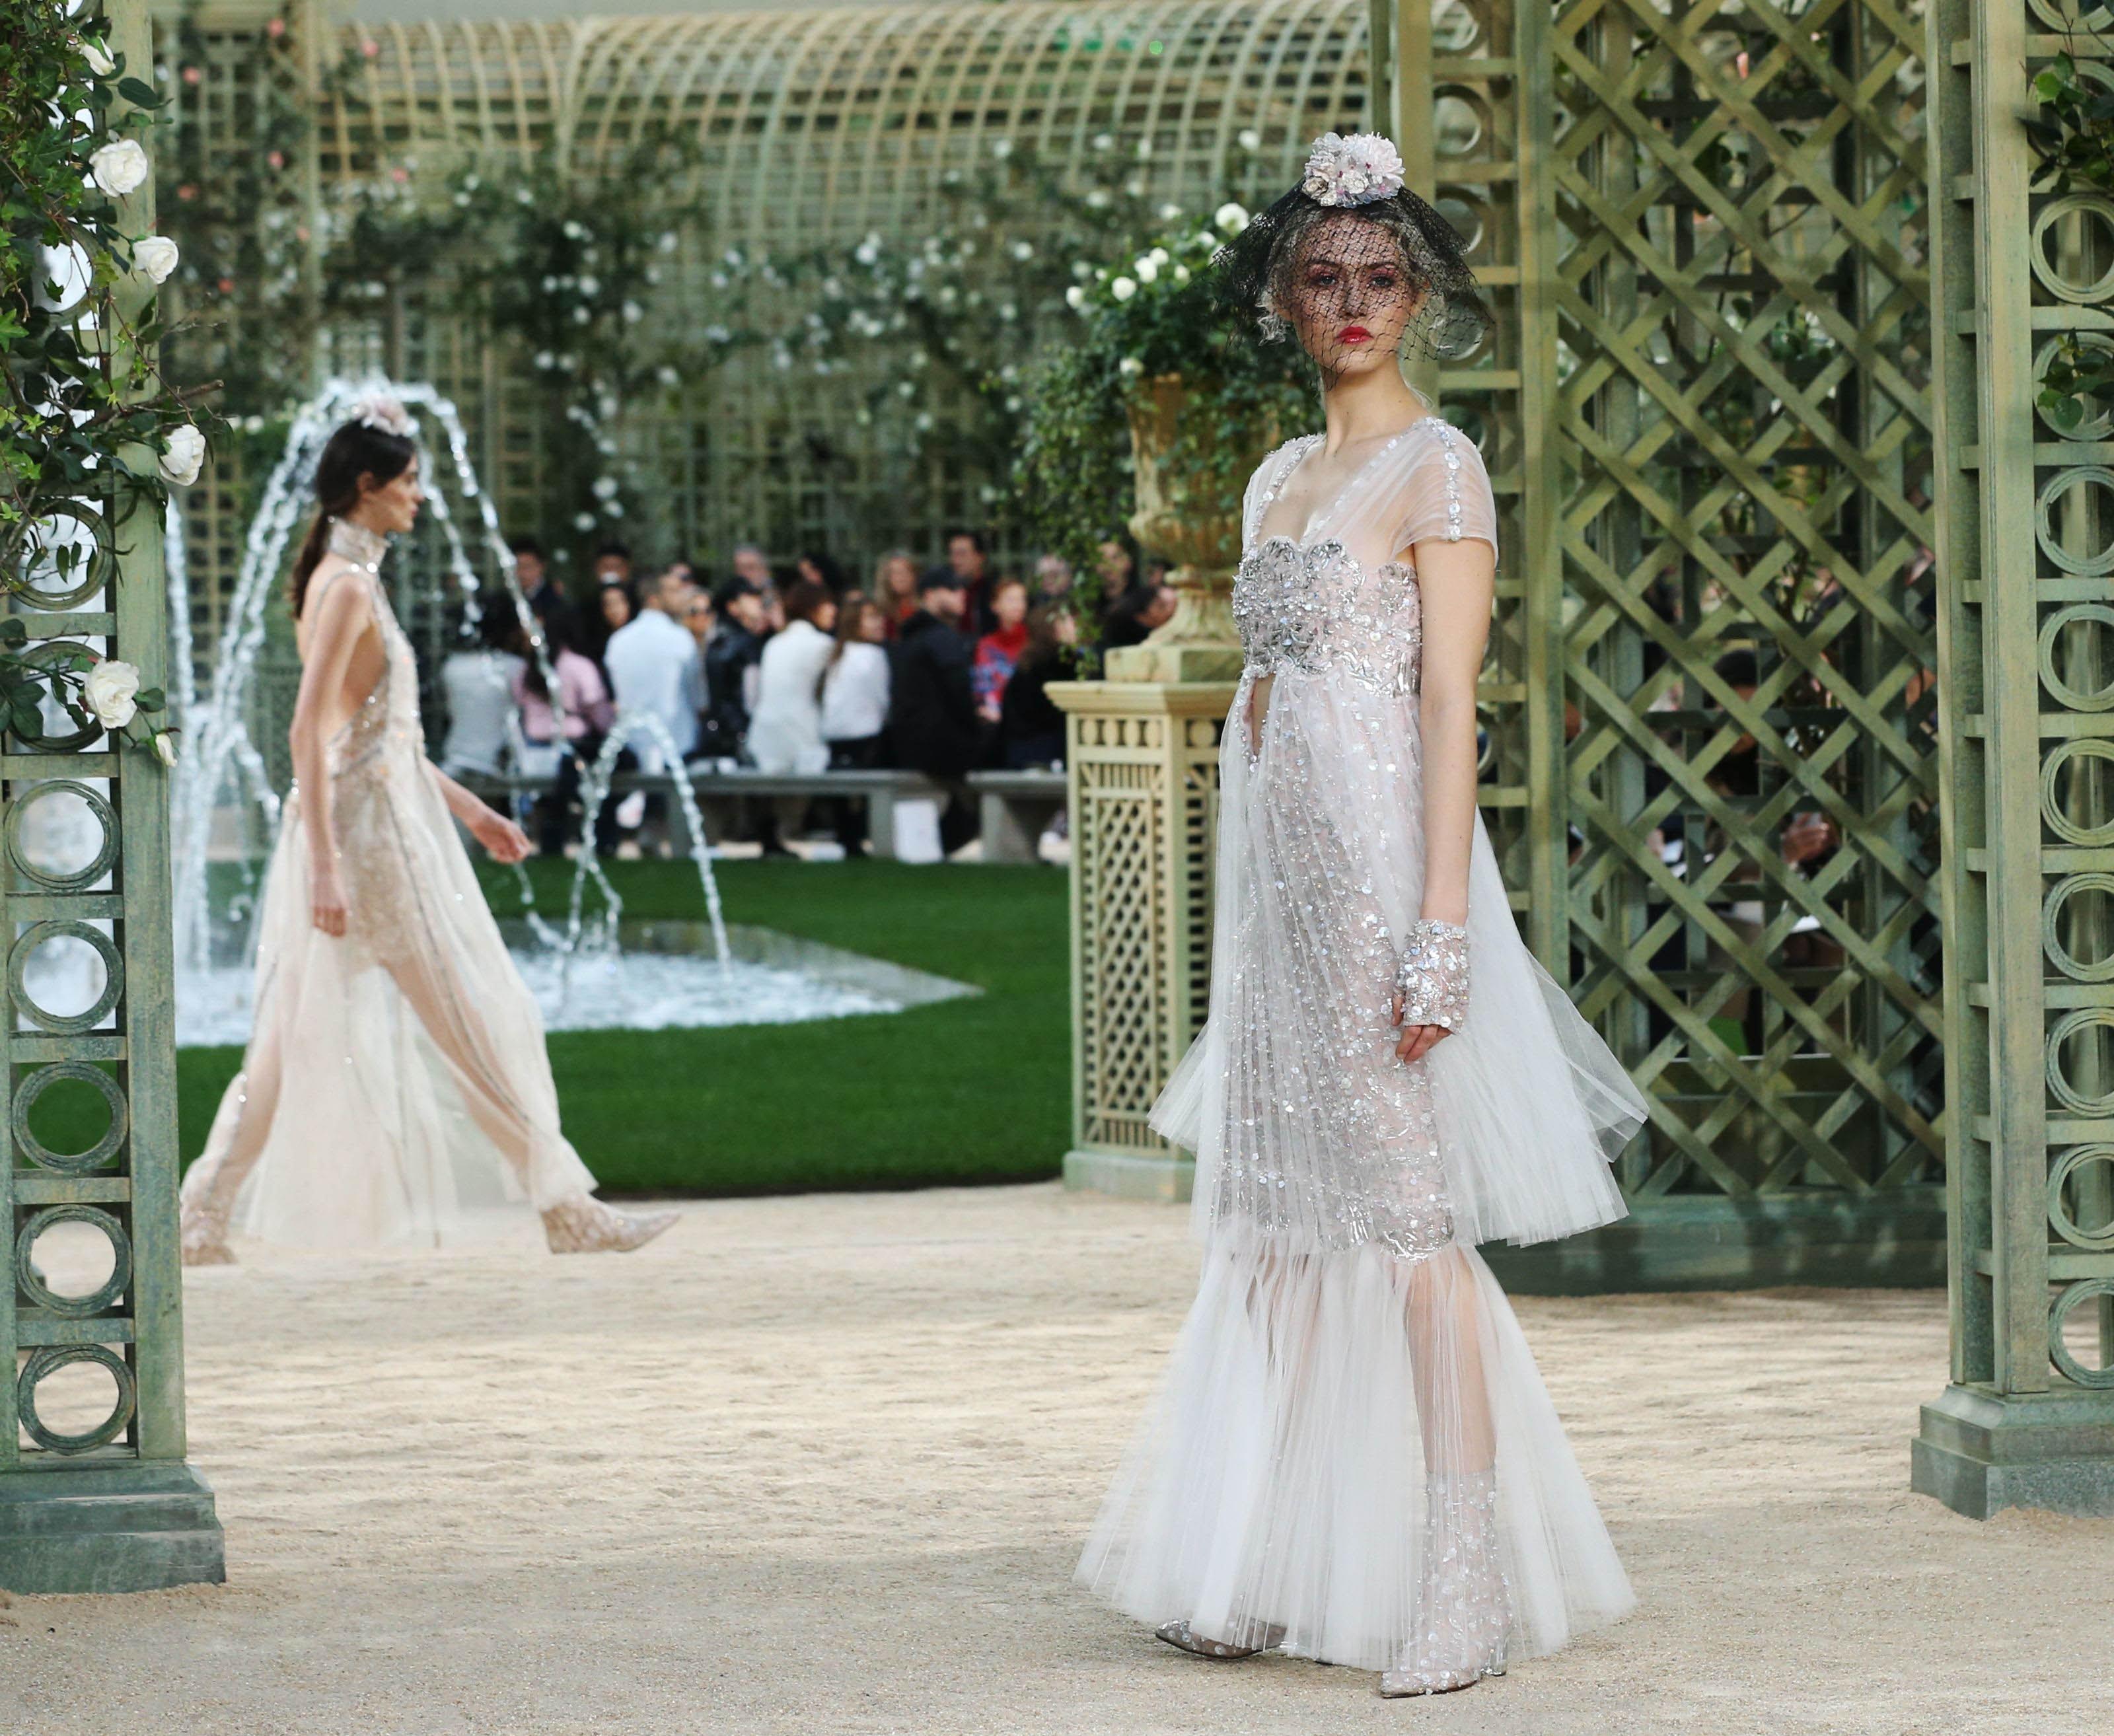 Chanel show, Runway, Spring Summer 2018, Haute Couture Fashion Week, Paris, France - 23 Jan 2018